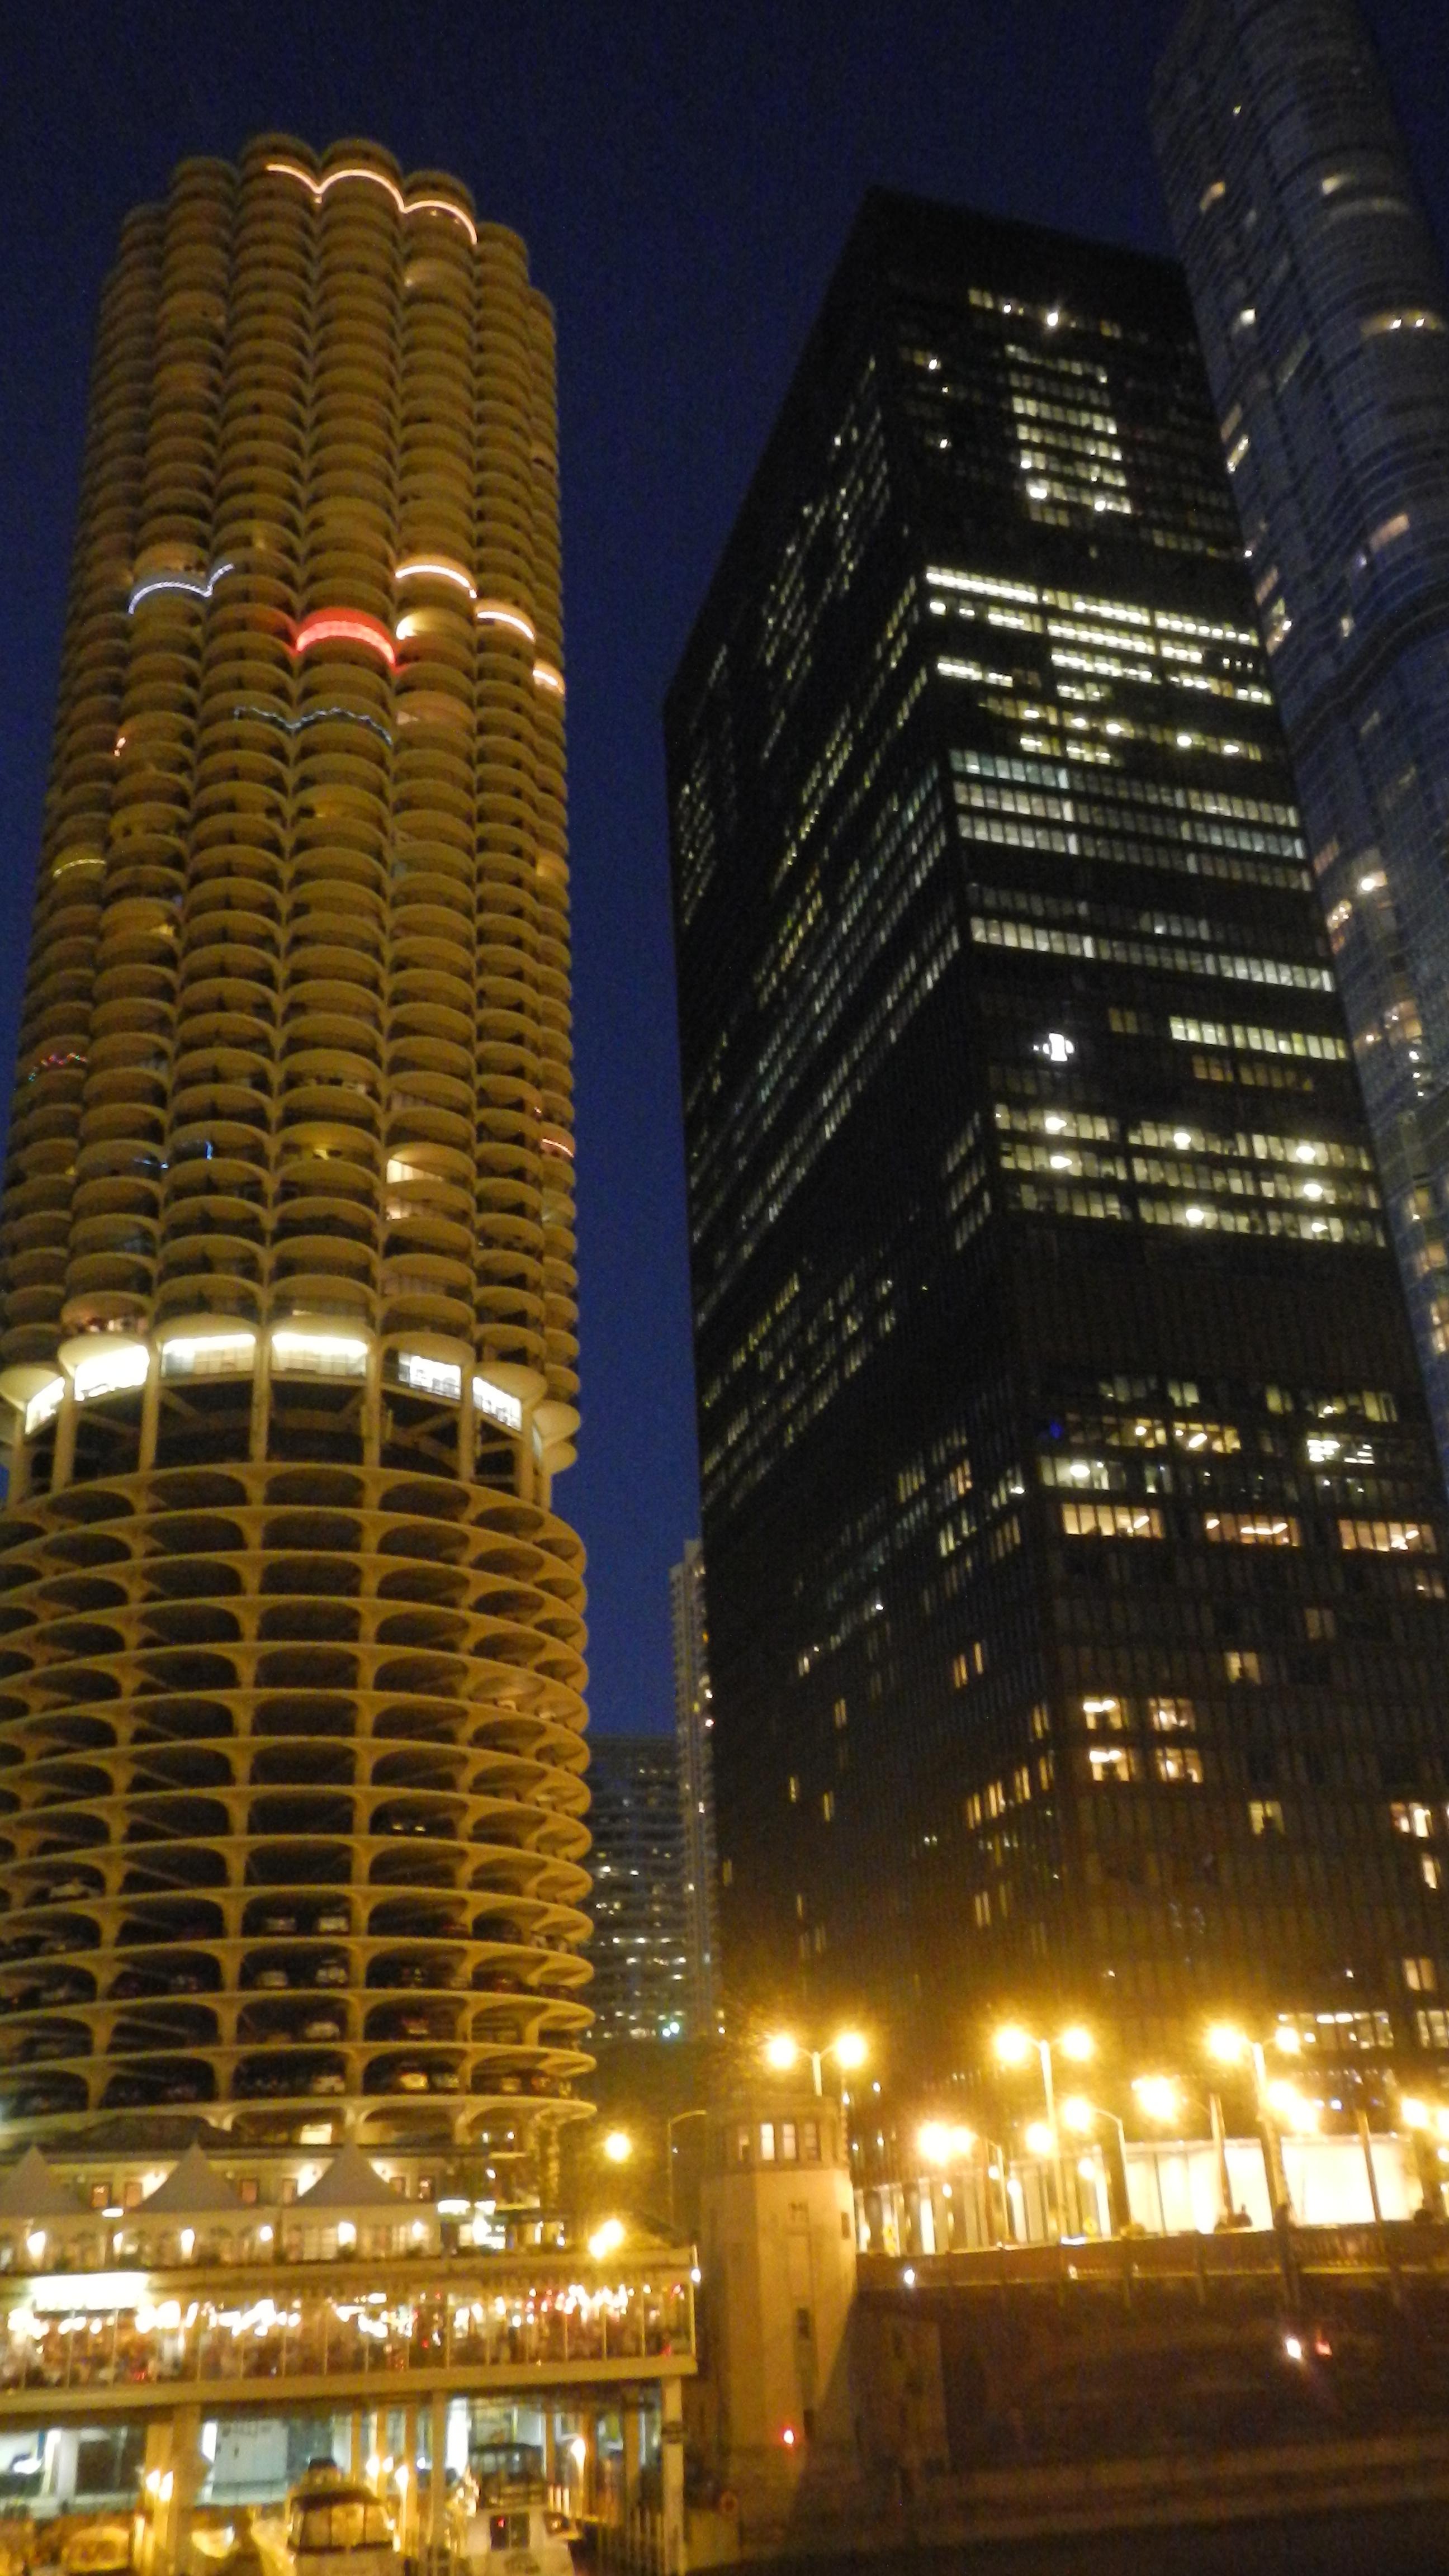 20131009_Chicago 092